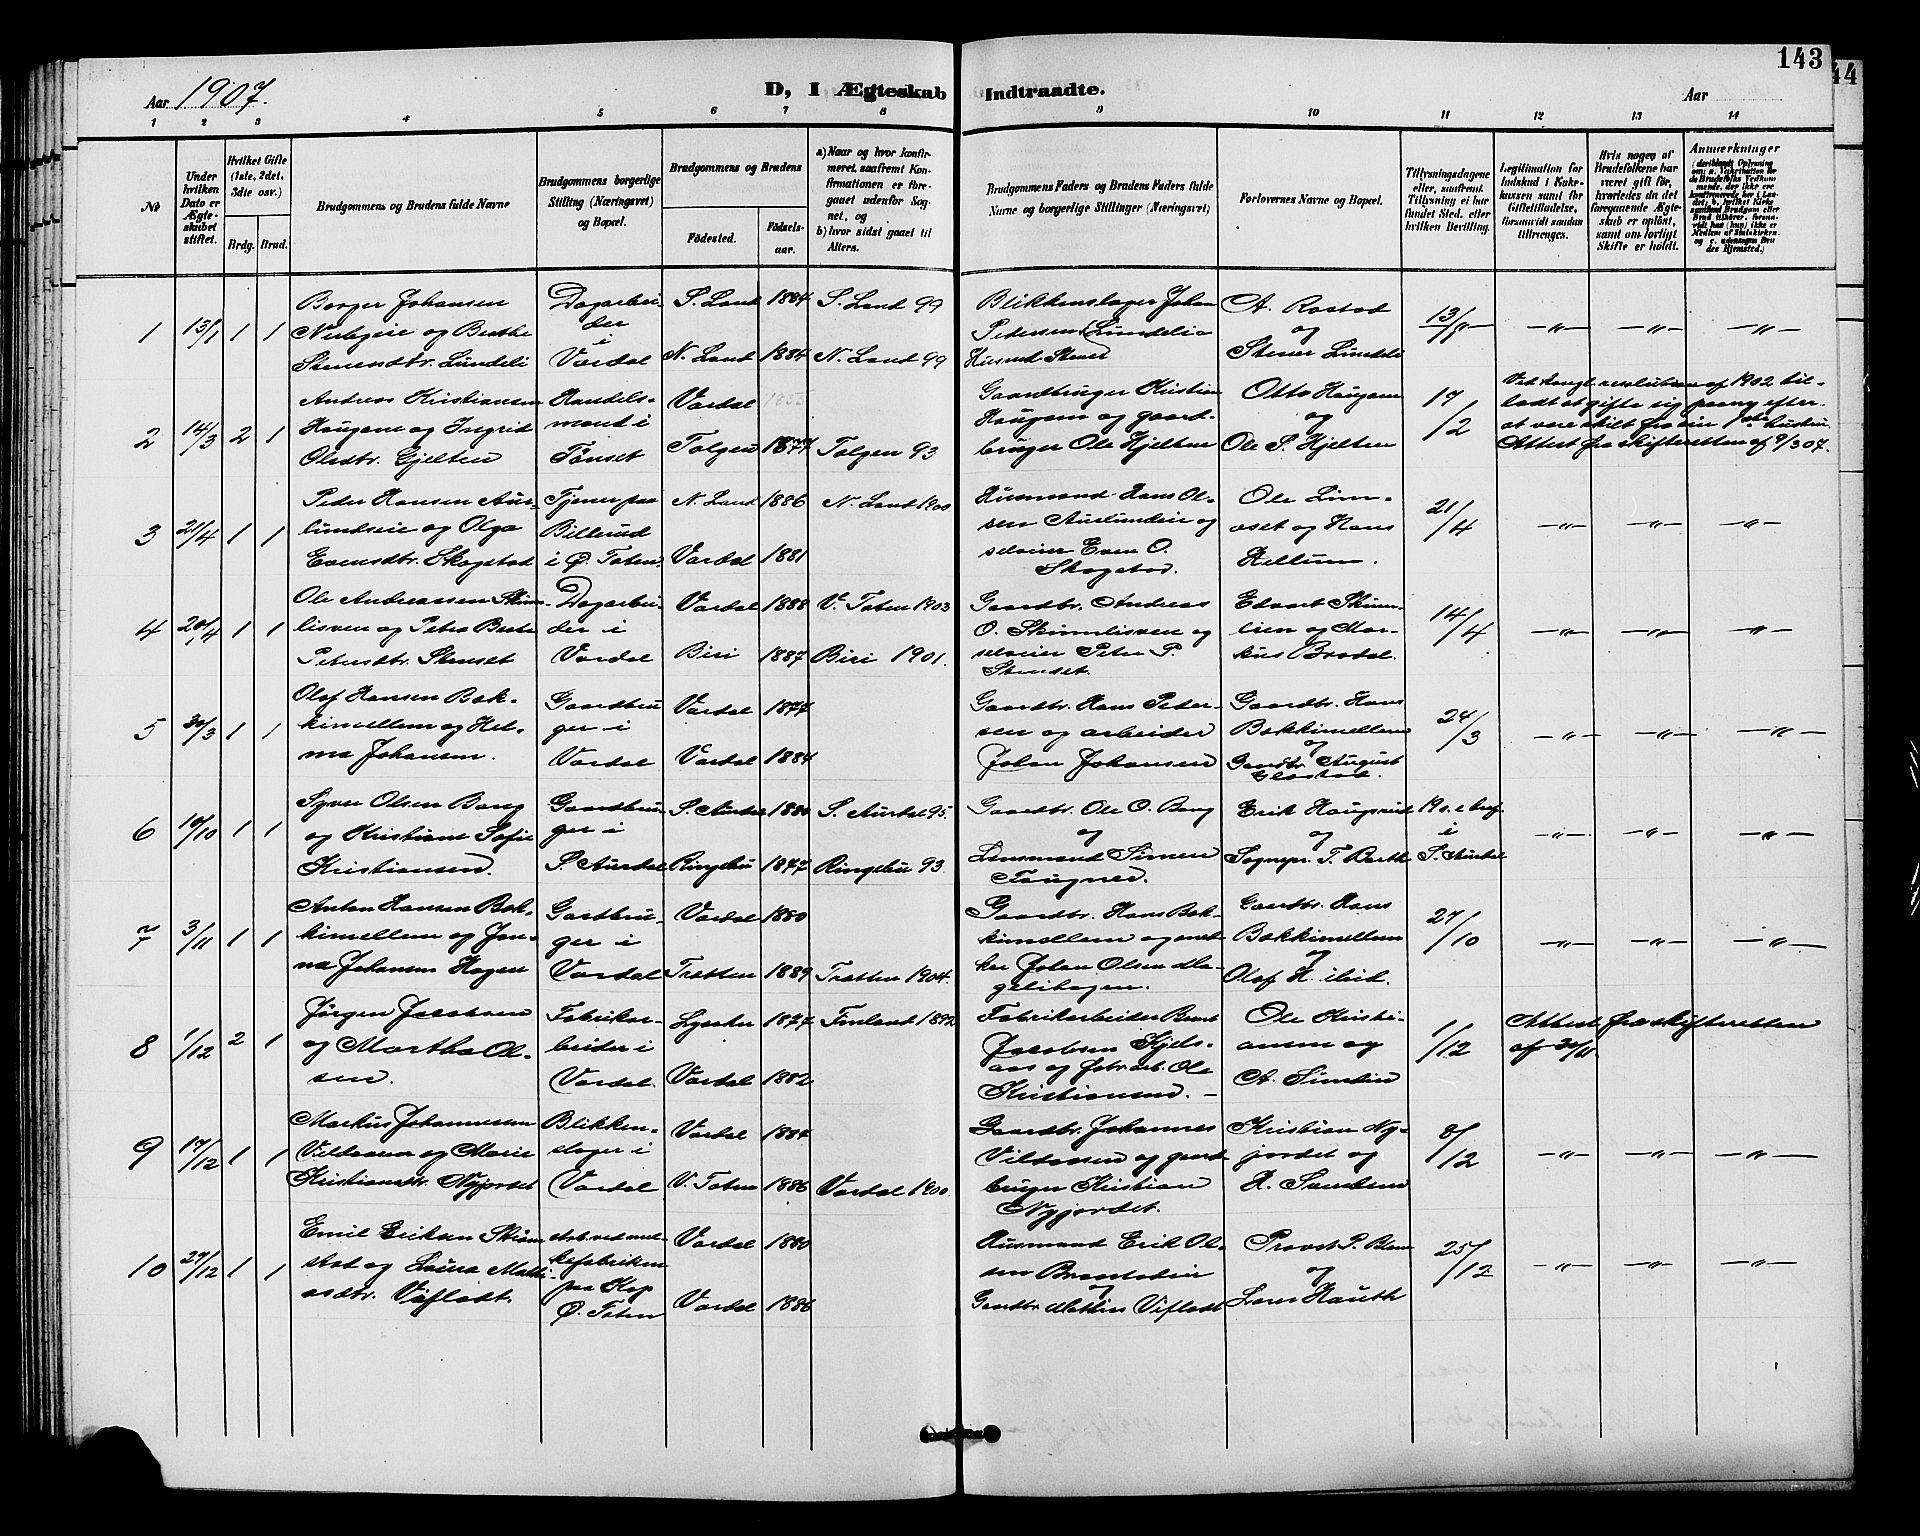 SAH, Vardal prestekontor, H/Ha/Hab/L0011: Klokkerbok nr. 11, 1899-1913, s. 143